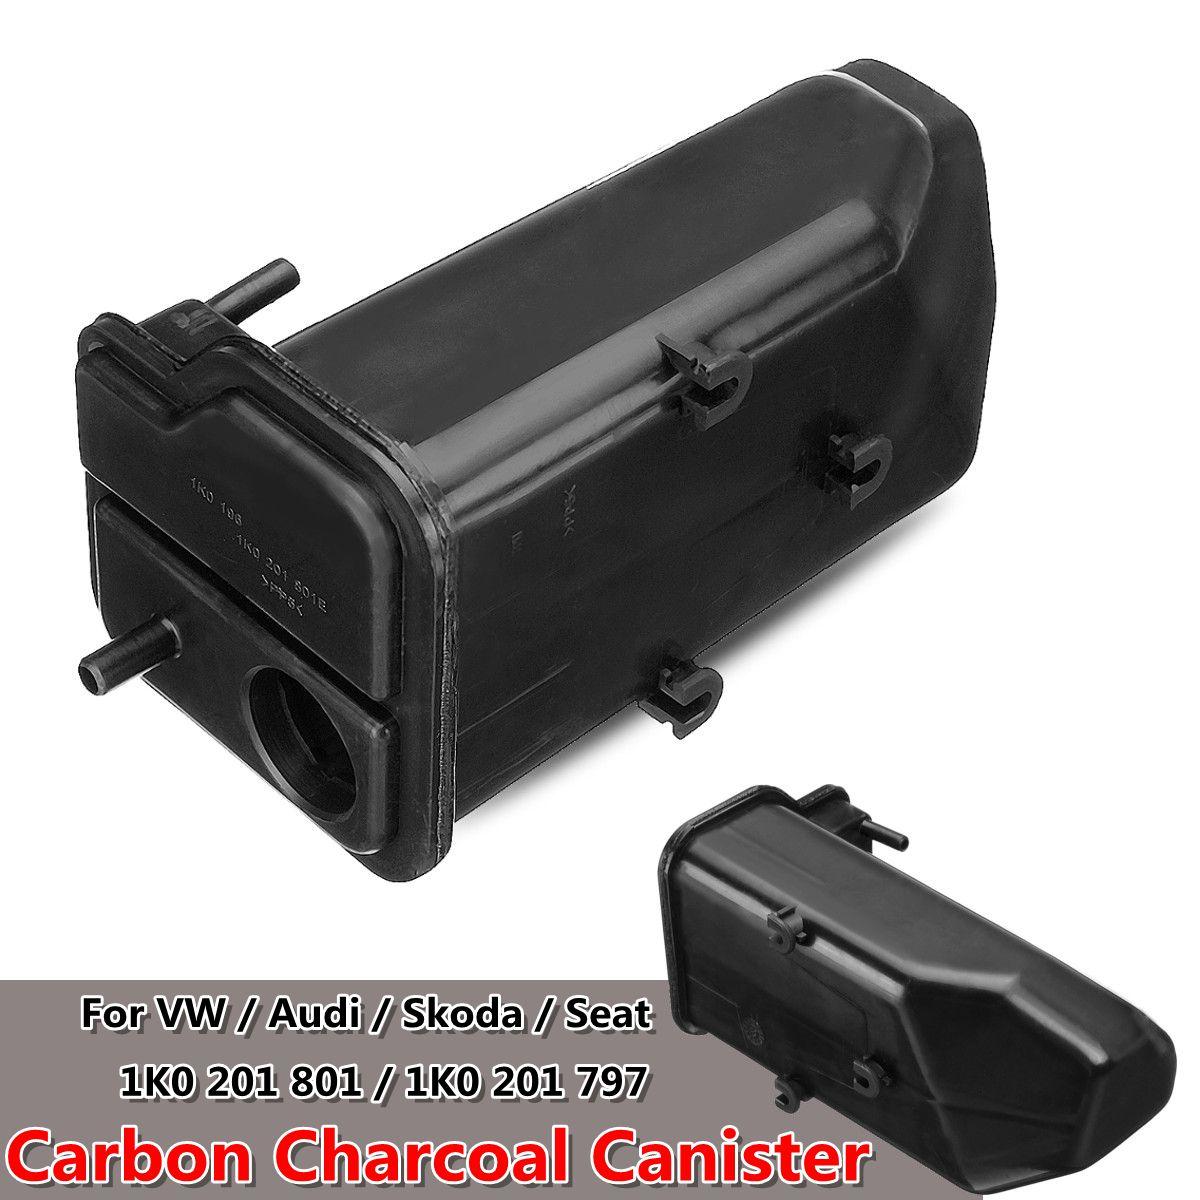 1K0 201 801 Car Carbon Charcoal Canister For Volkswagen For VW Jetta Golf For Audi A3 TT For Skoda Seat 1K0 201 801E 1K0 201 797